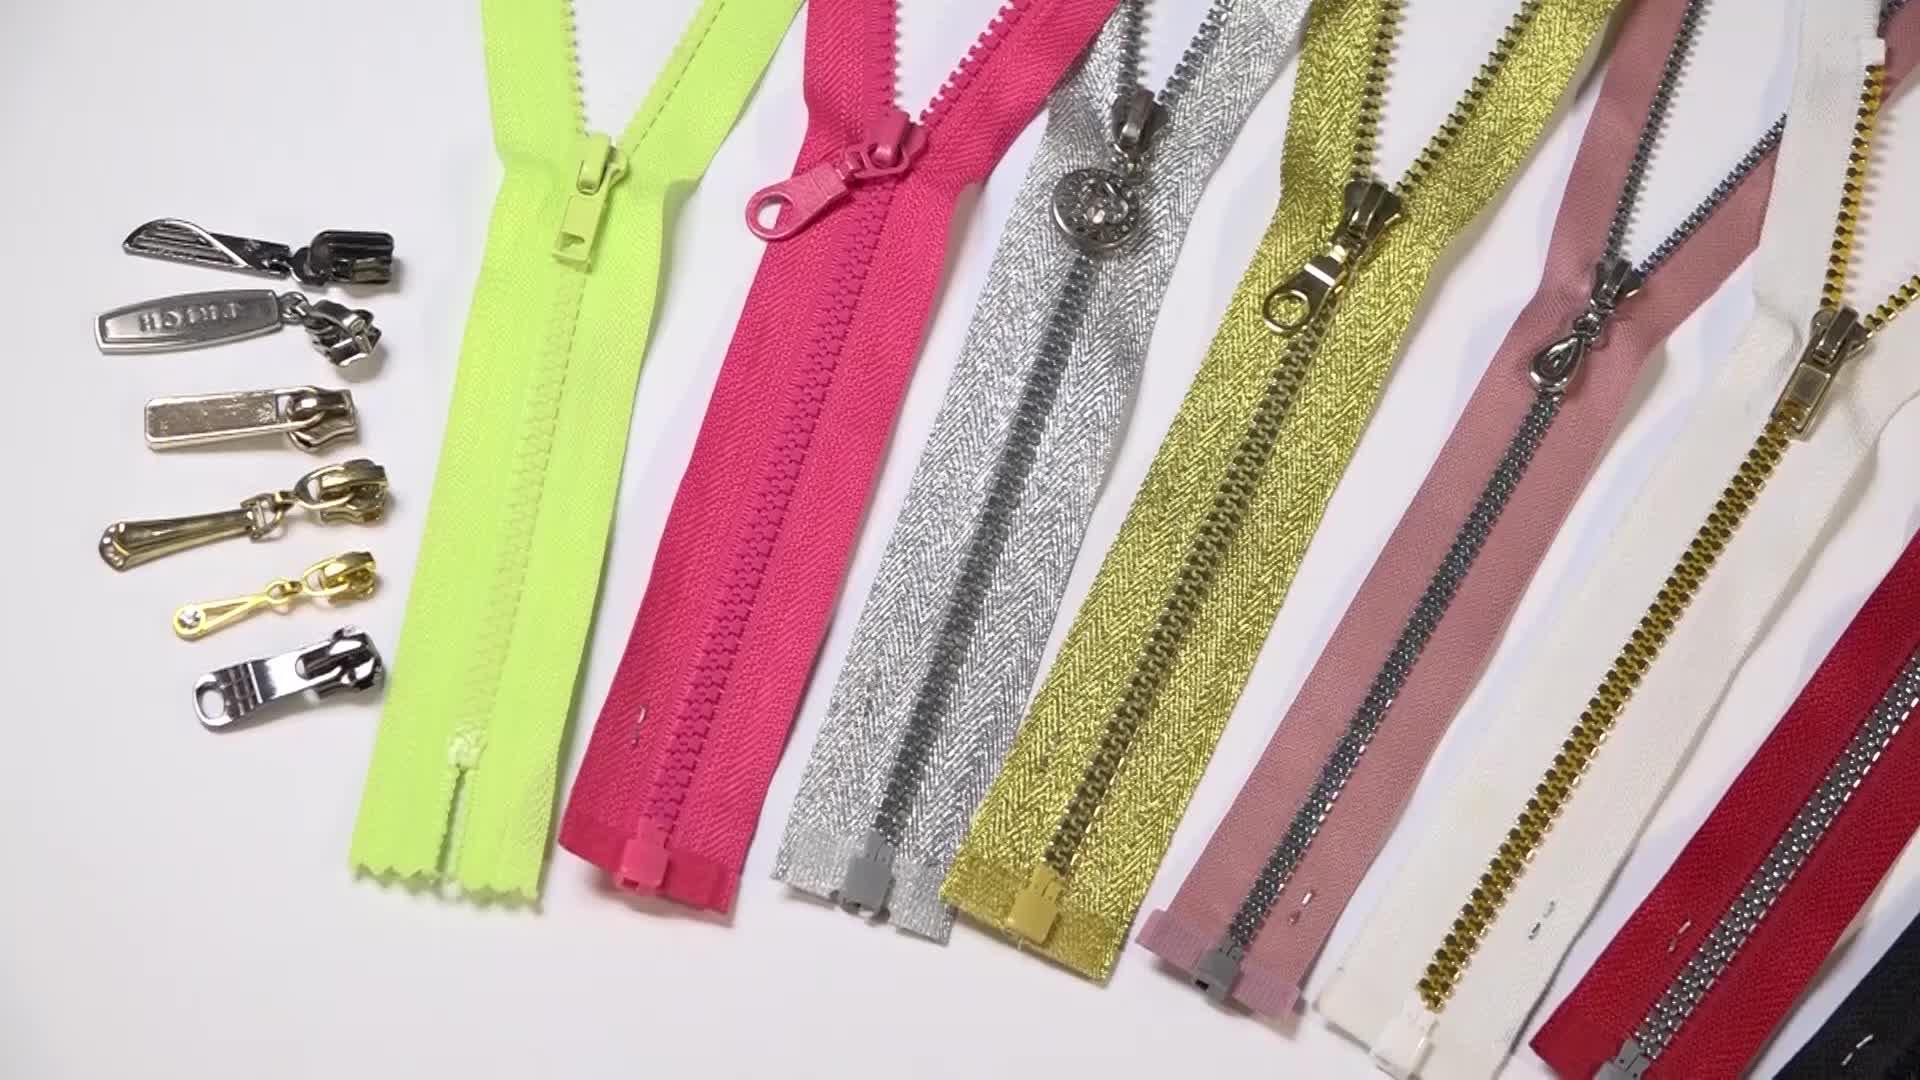 #5 Reflective Plastic/Resin Separating Zipper for Raincoats